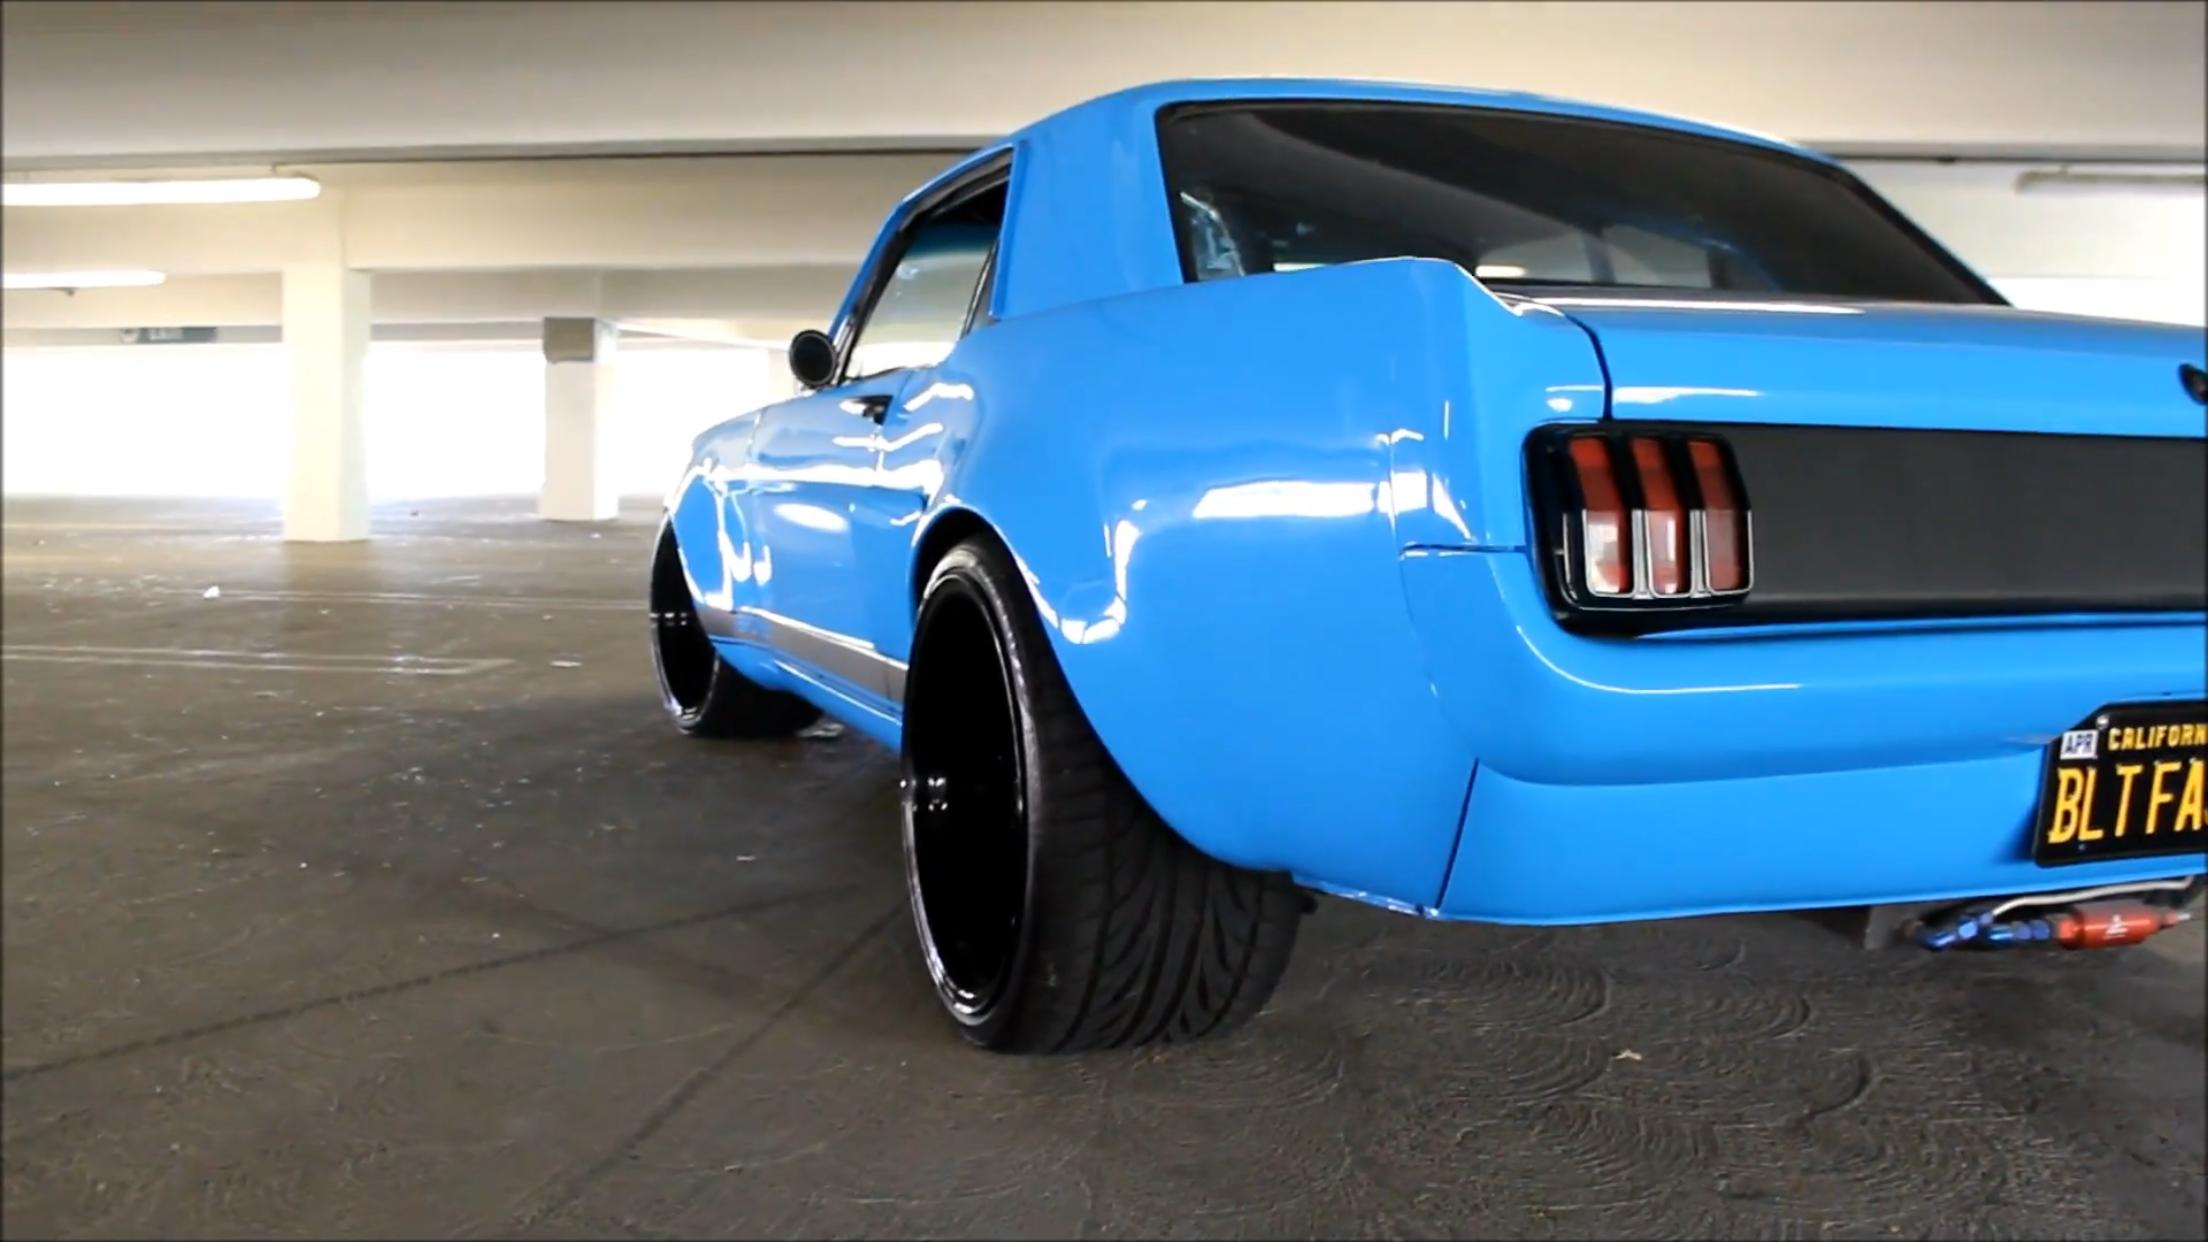 1966 Mustang Restomod Wide Body